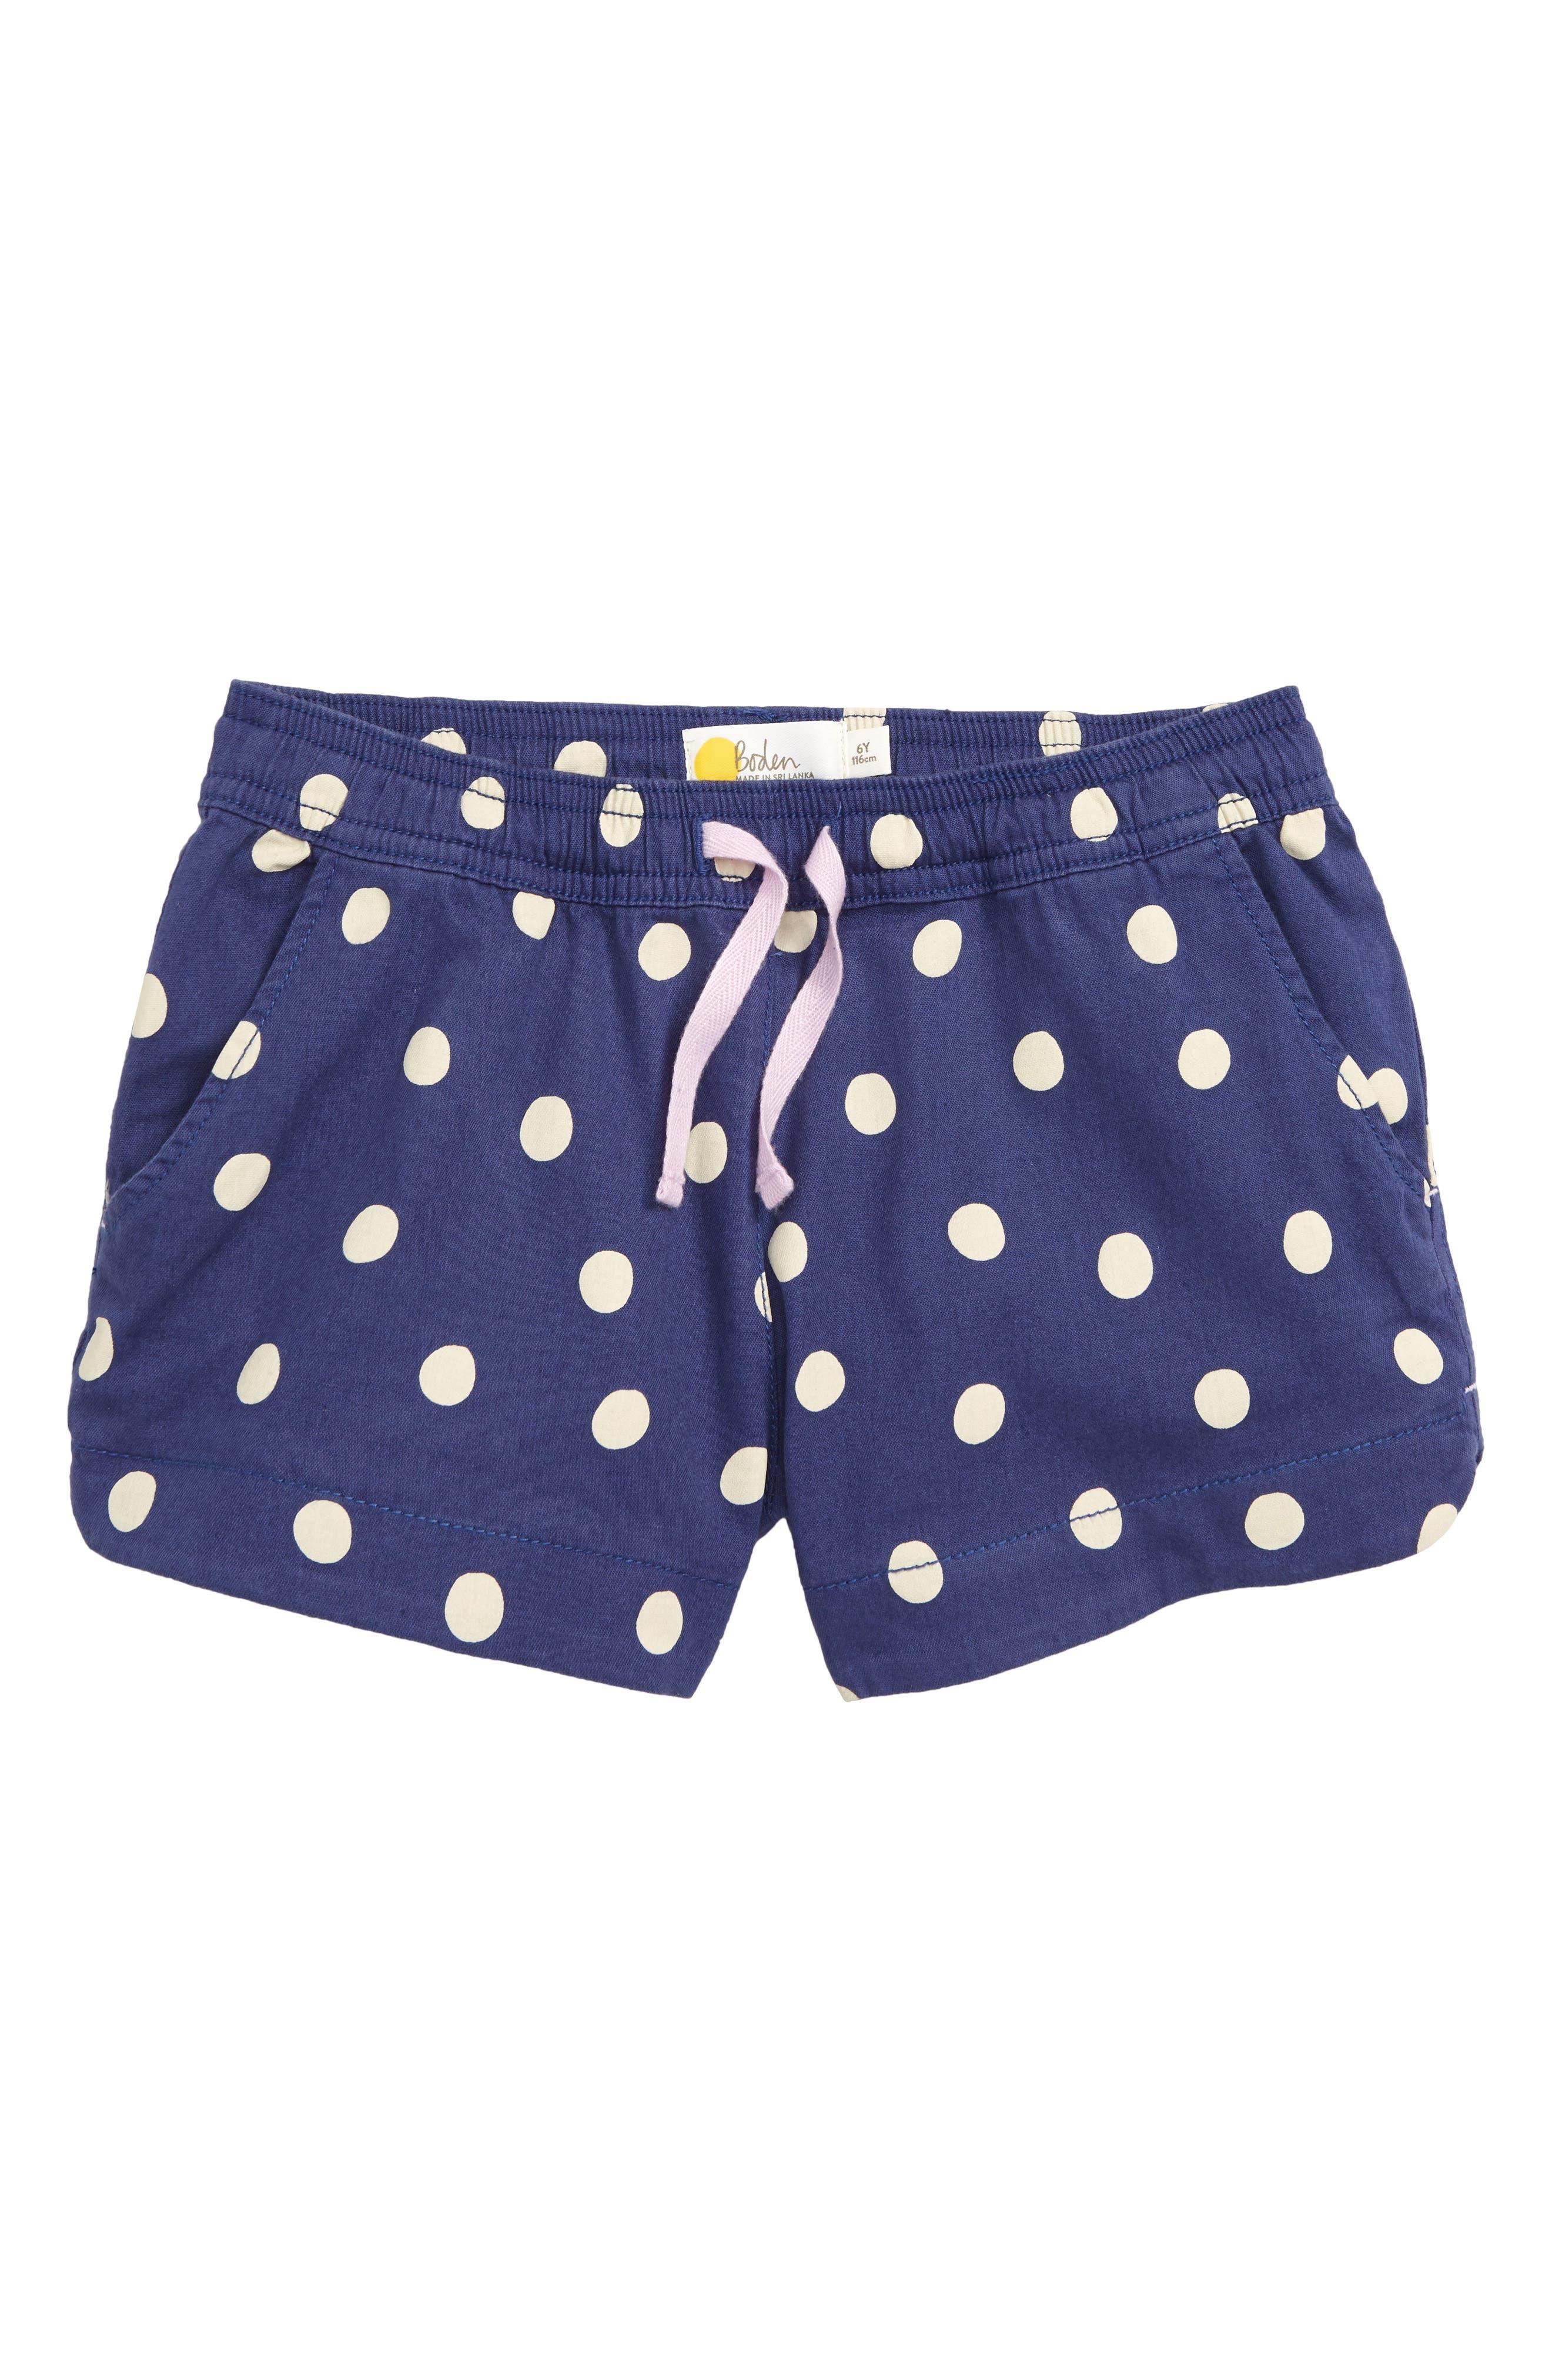 BODEN,                             Heart Pocket Shorts,                             Main thumbnail 1, color,                             BLU STARBOARD BLUE/ ECRU SPOT